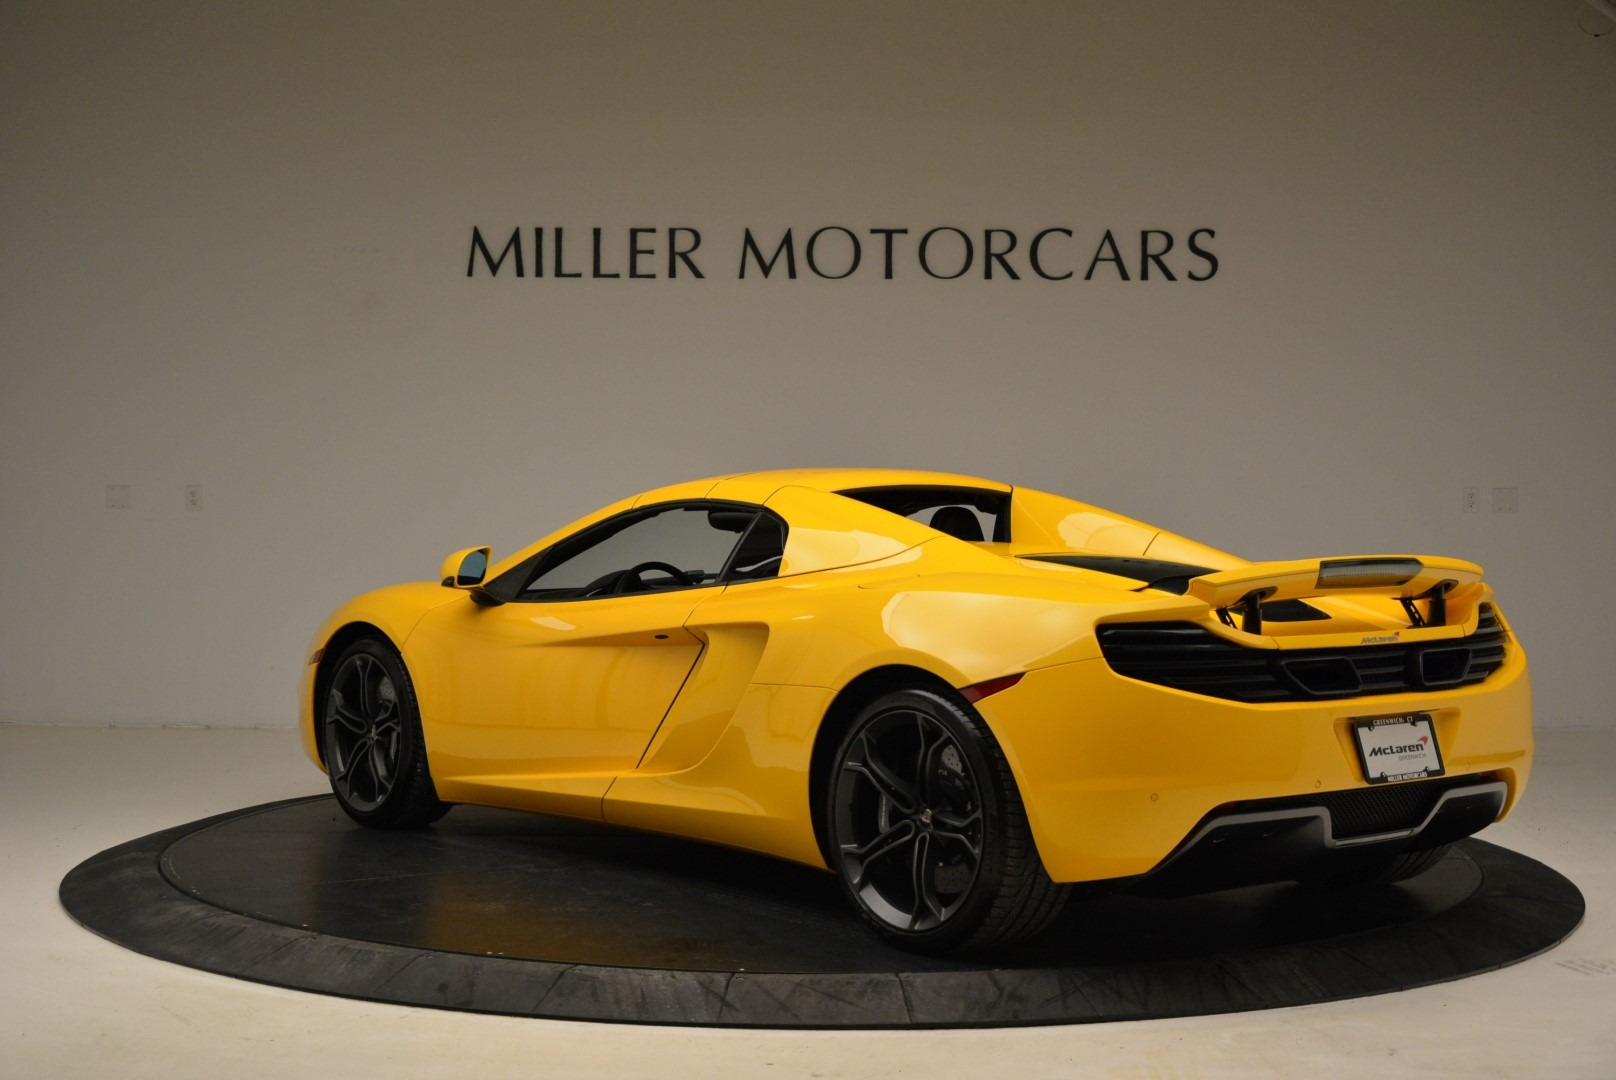 Used 2014 McLaren MP4-12C Spider For Sale In Greenwich, CT. Alfa Romeo of Greenwich, 3134 2057_p17